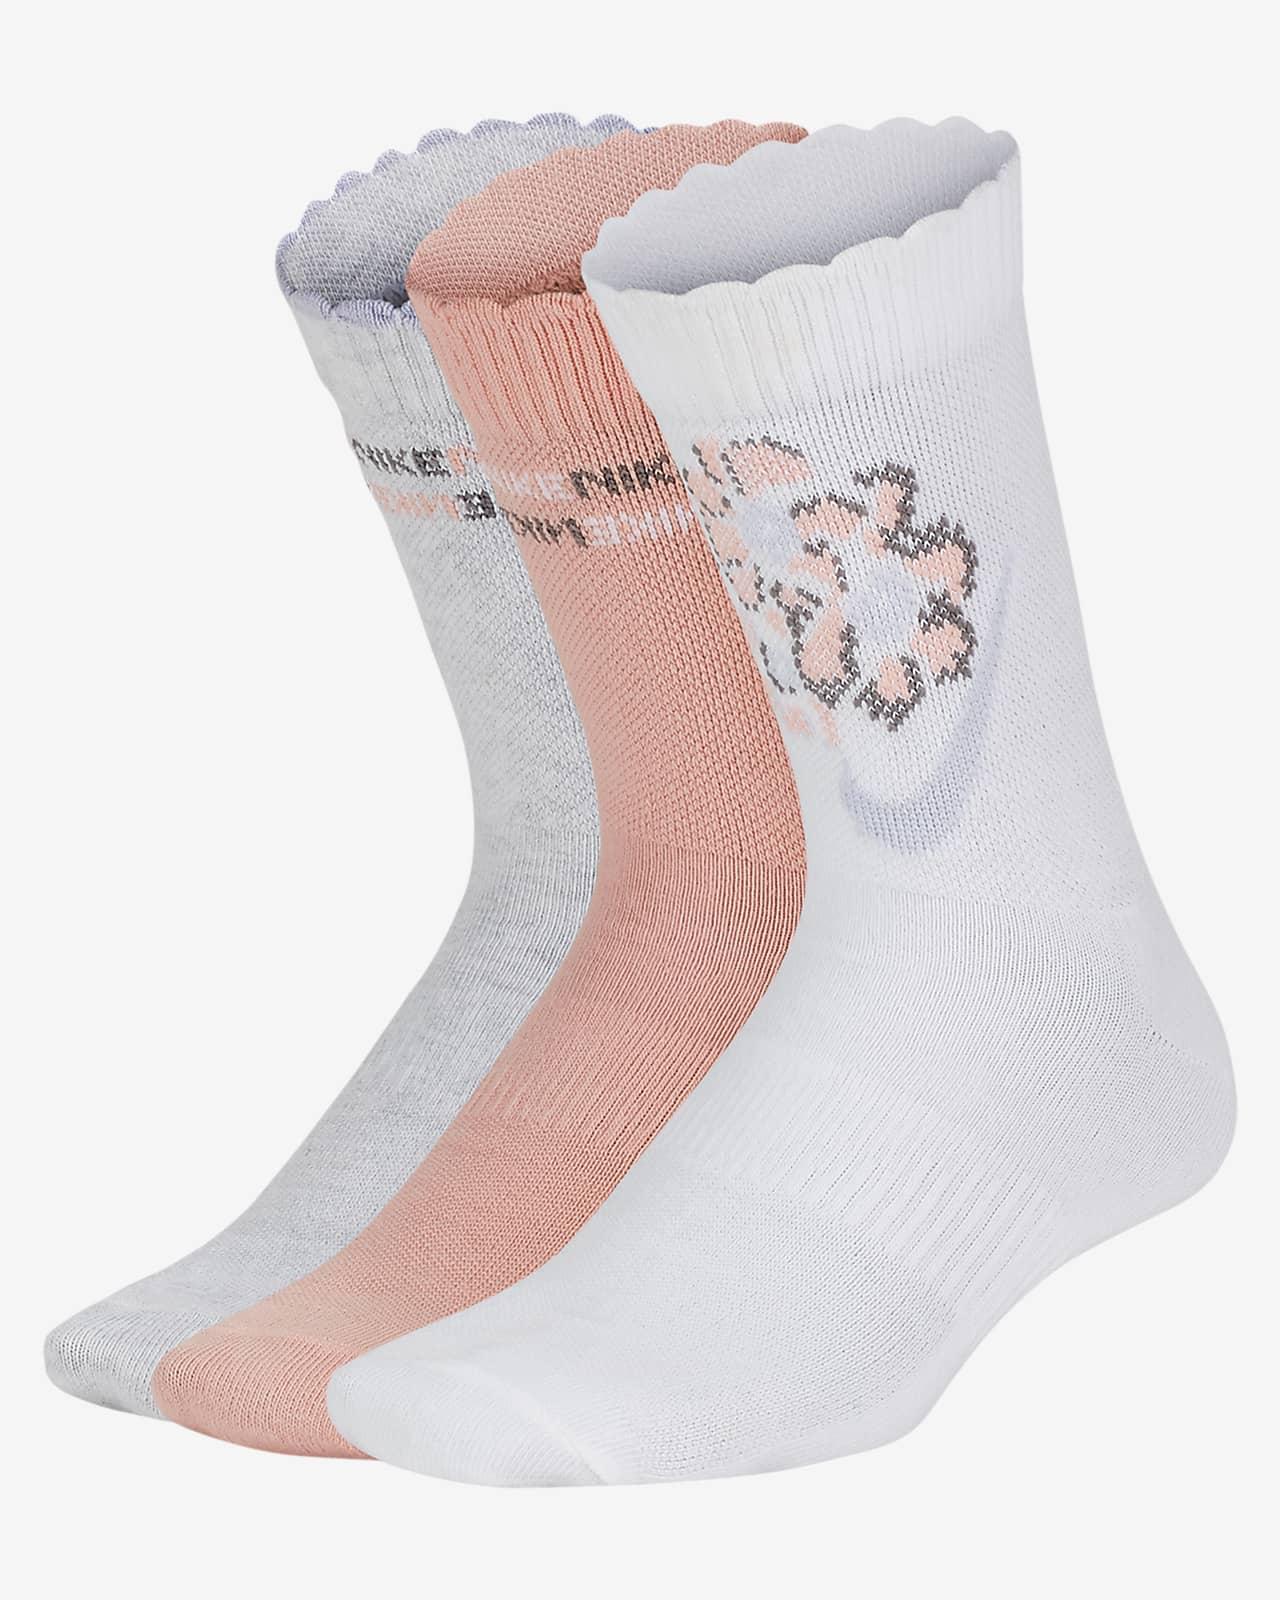 Nike Everyday Lightweight Kids' Crew Socks (3 Pair)